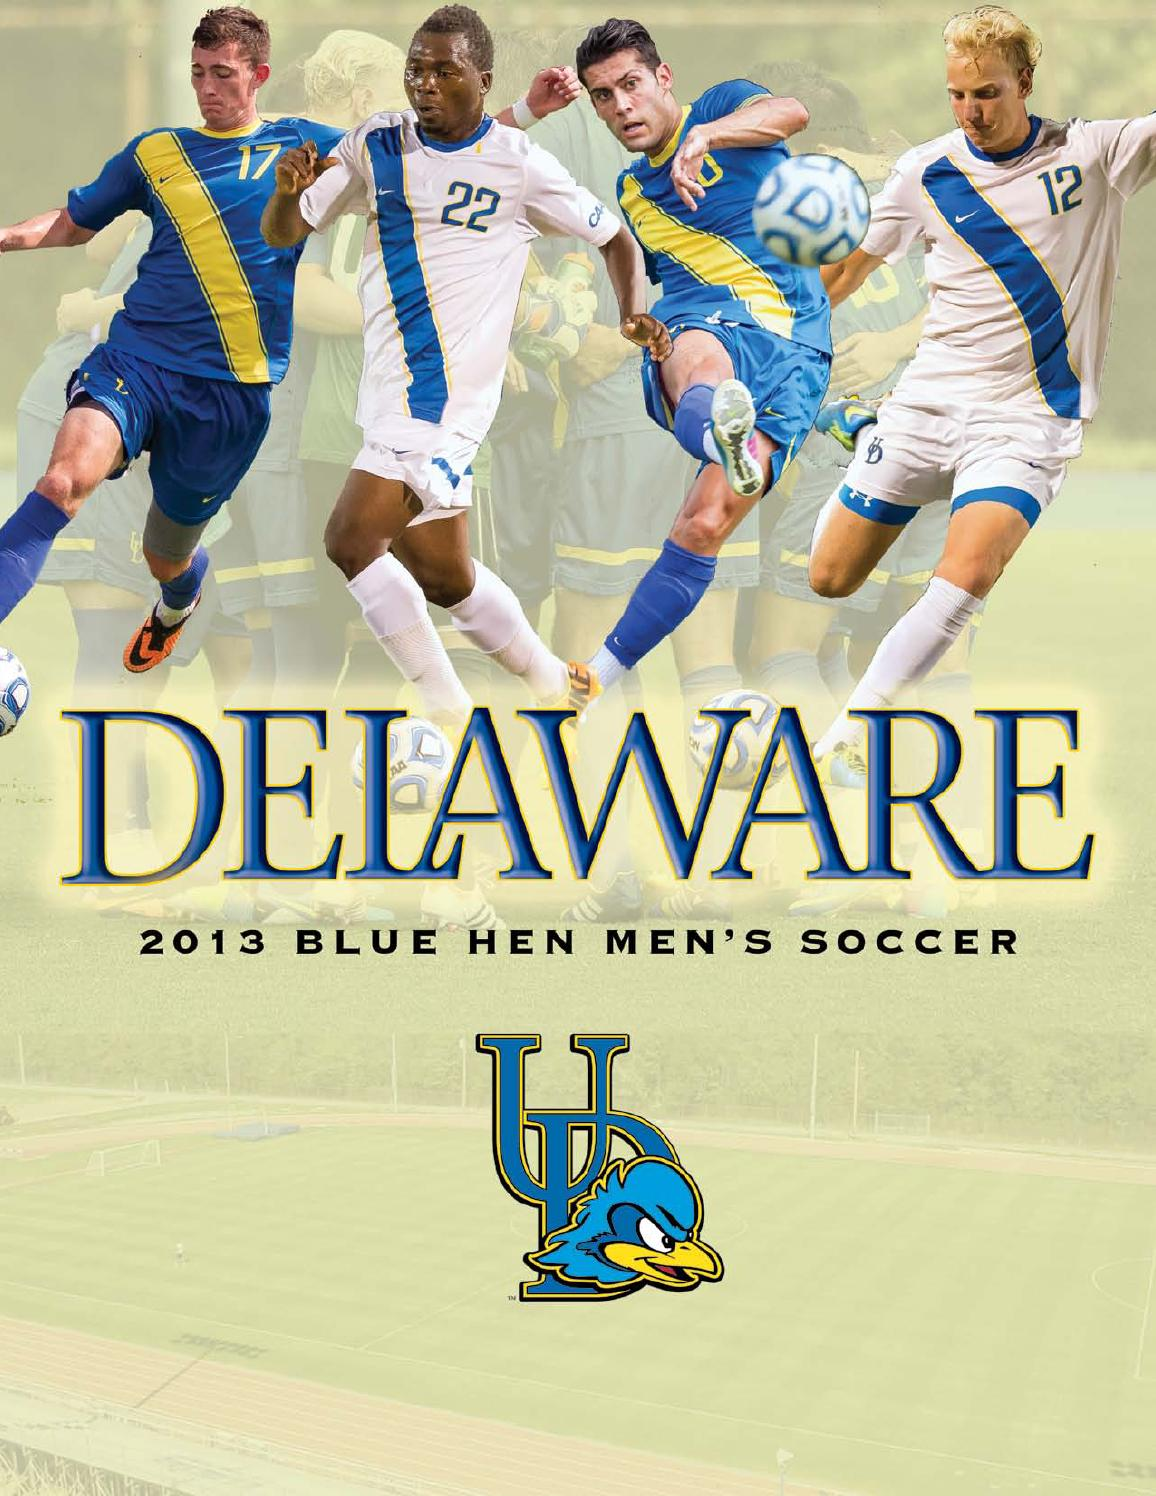 2013 Men's Soccer Media Guide by UDBlueHens Delaware - issuu